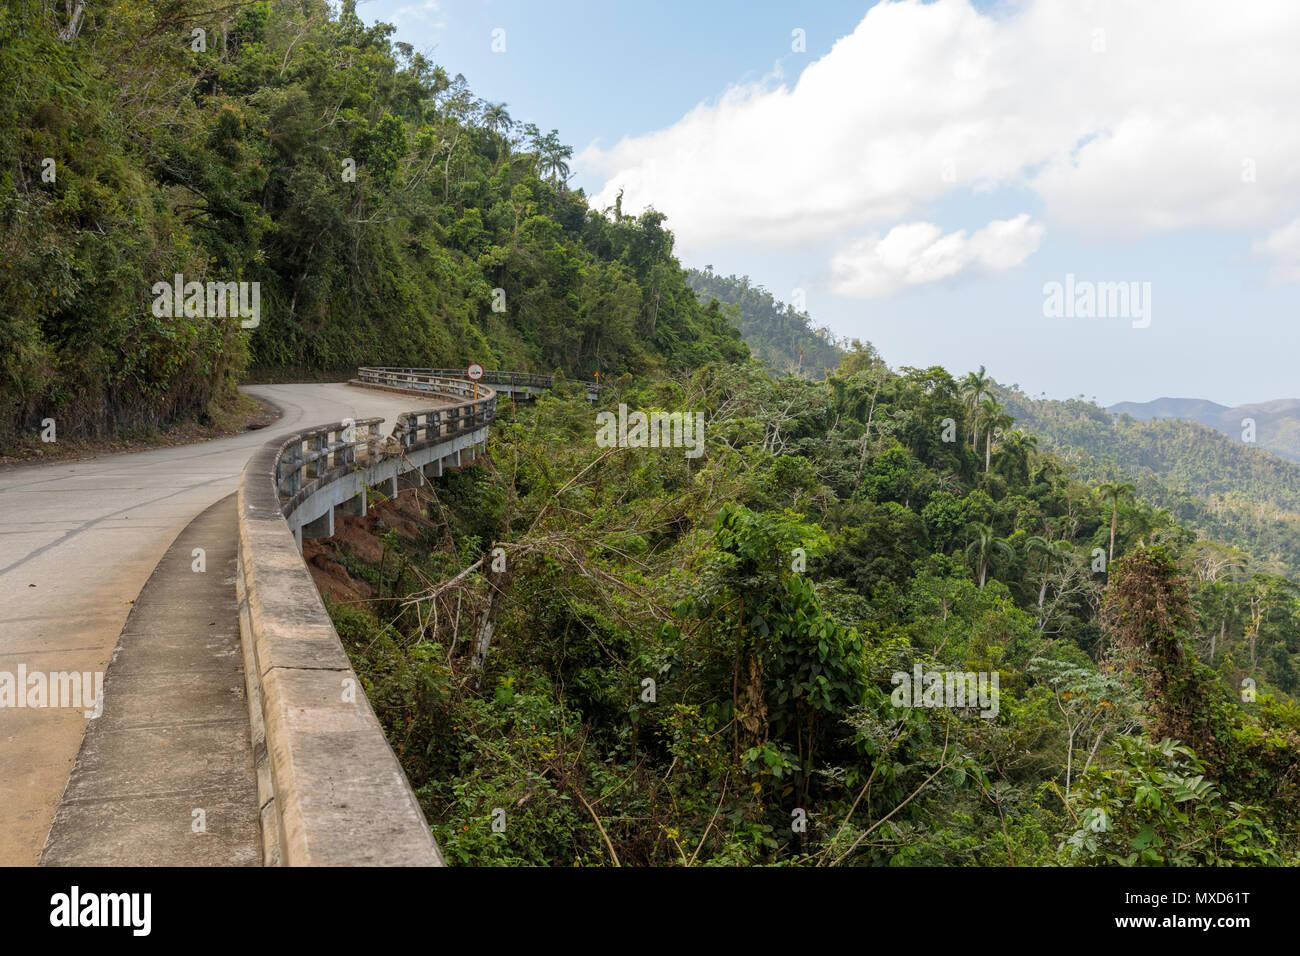 view over the Alejandro de Humboldt National Park on the road to santiago de cuba. region guantanamo cuba. UNESCO world heritage site - Stock Image